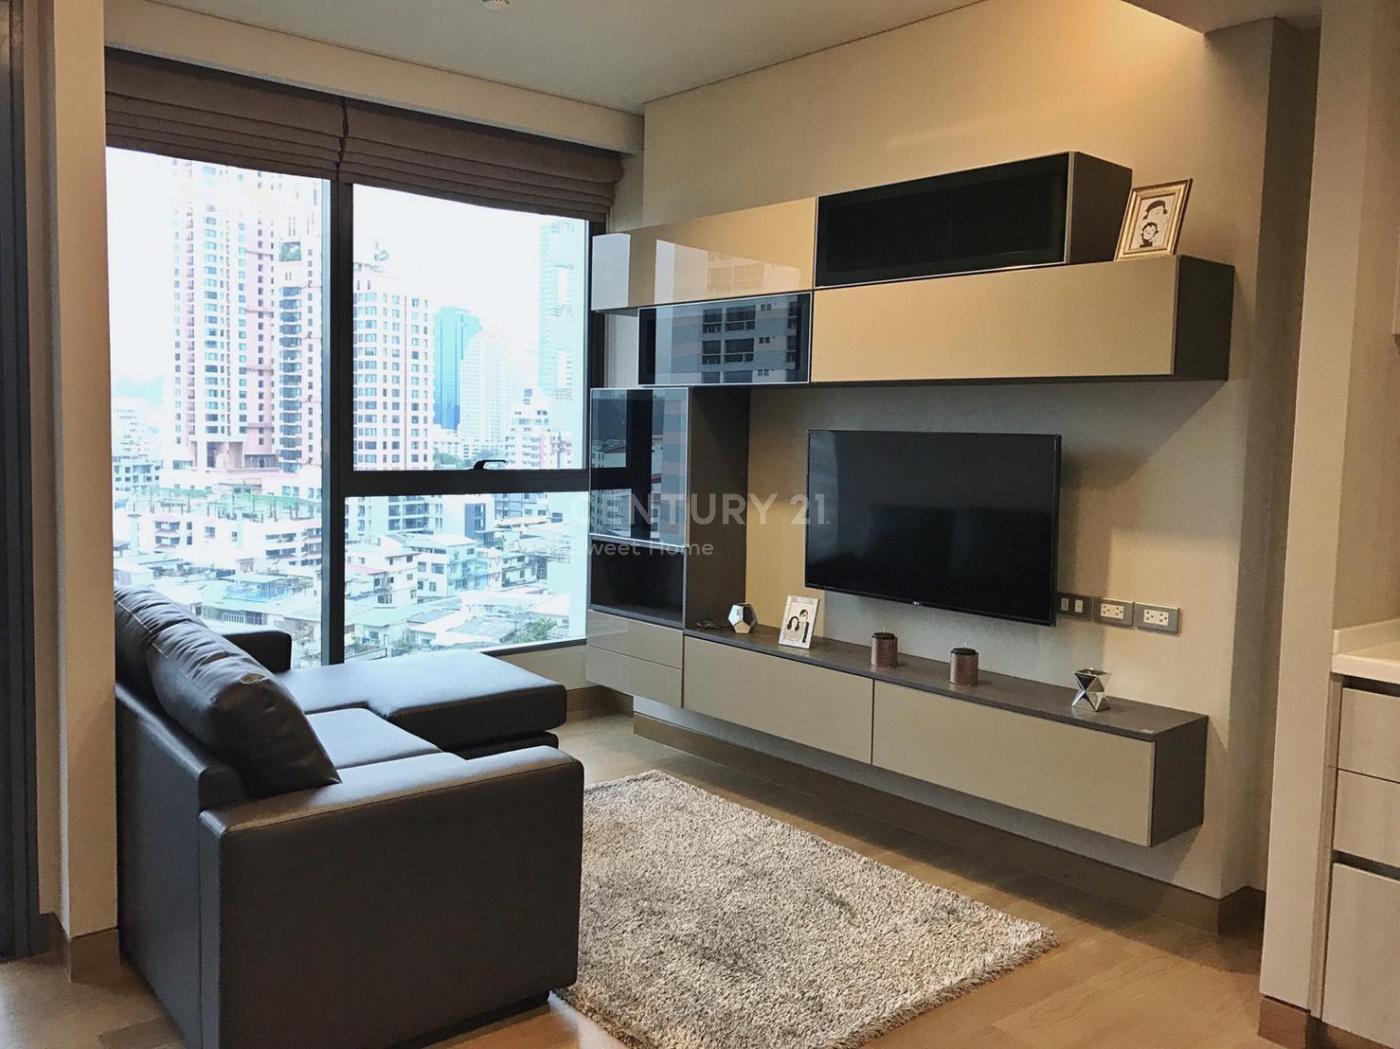 1 bedrooms For Rent in Phrom phong, Bangkok